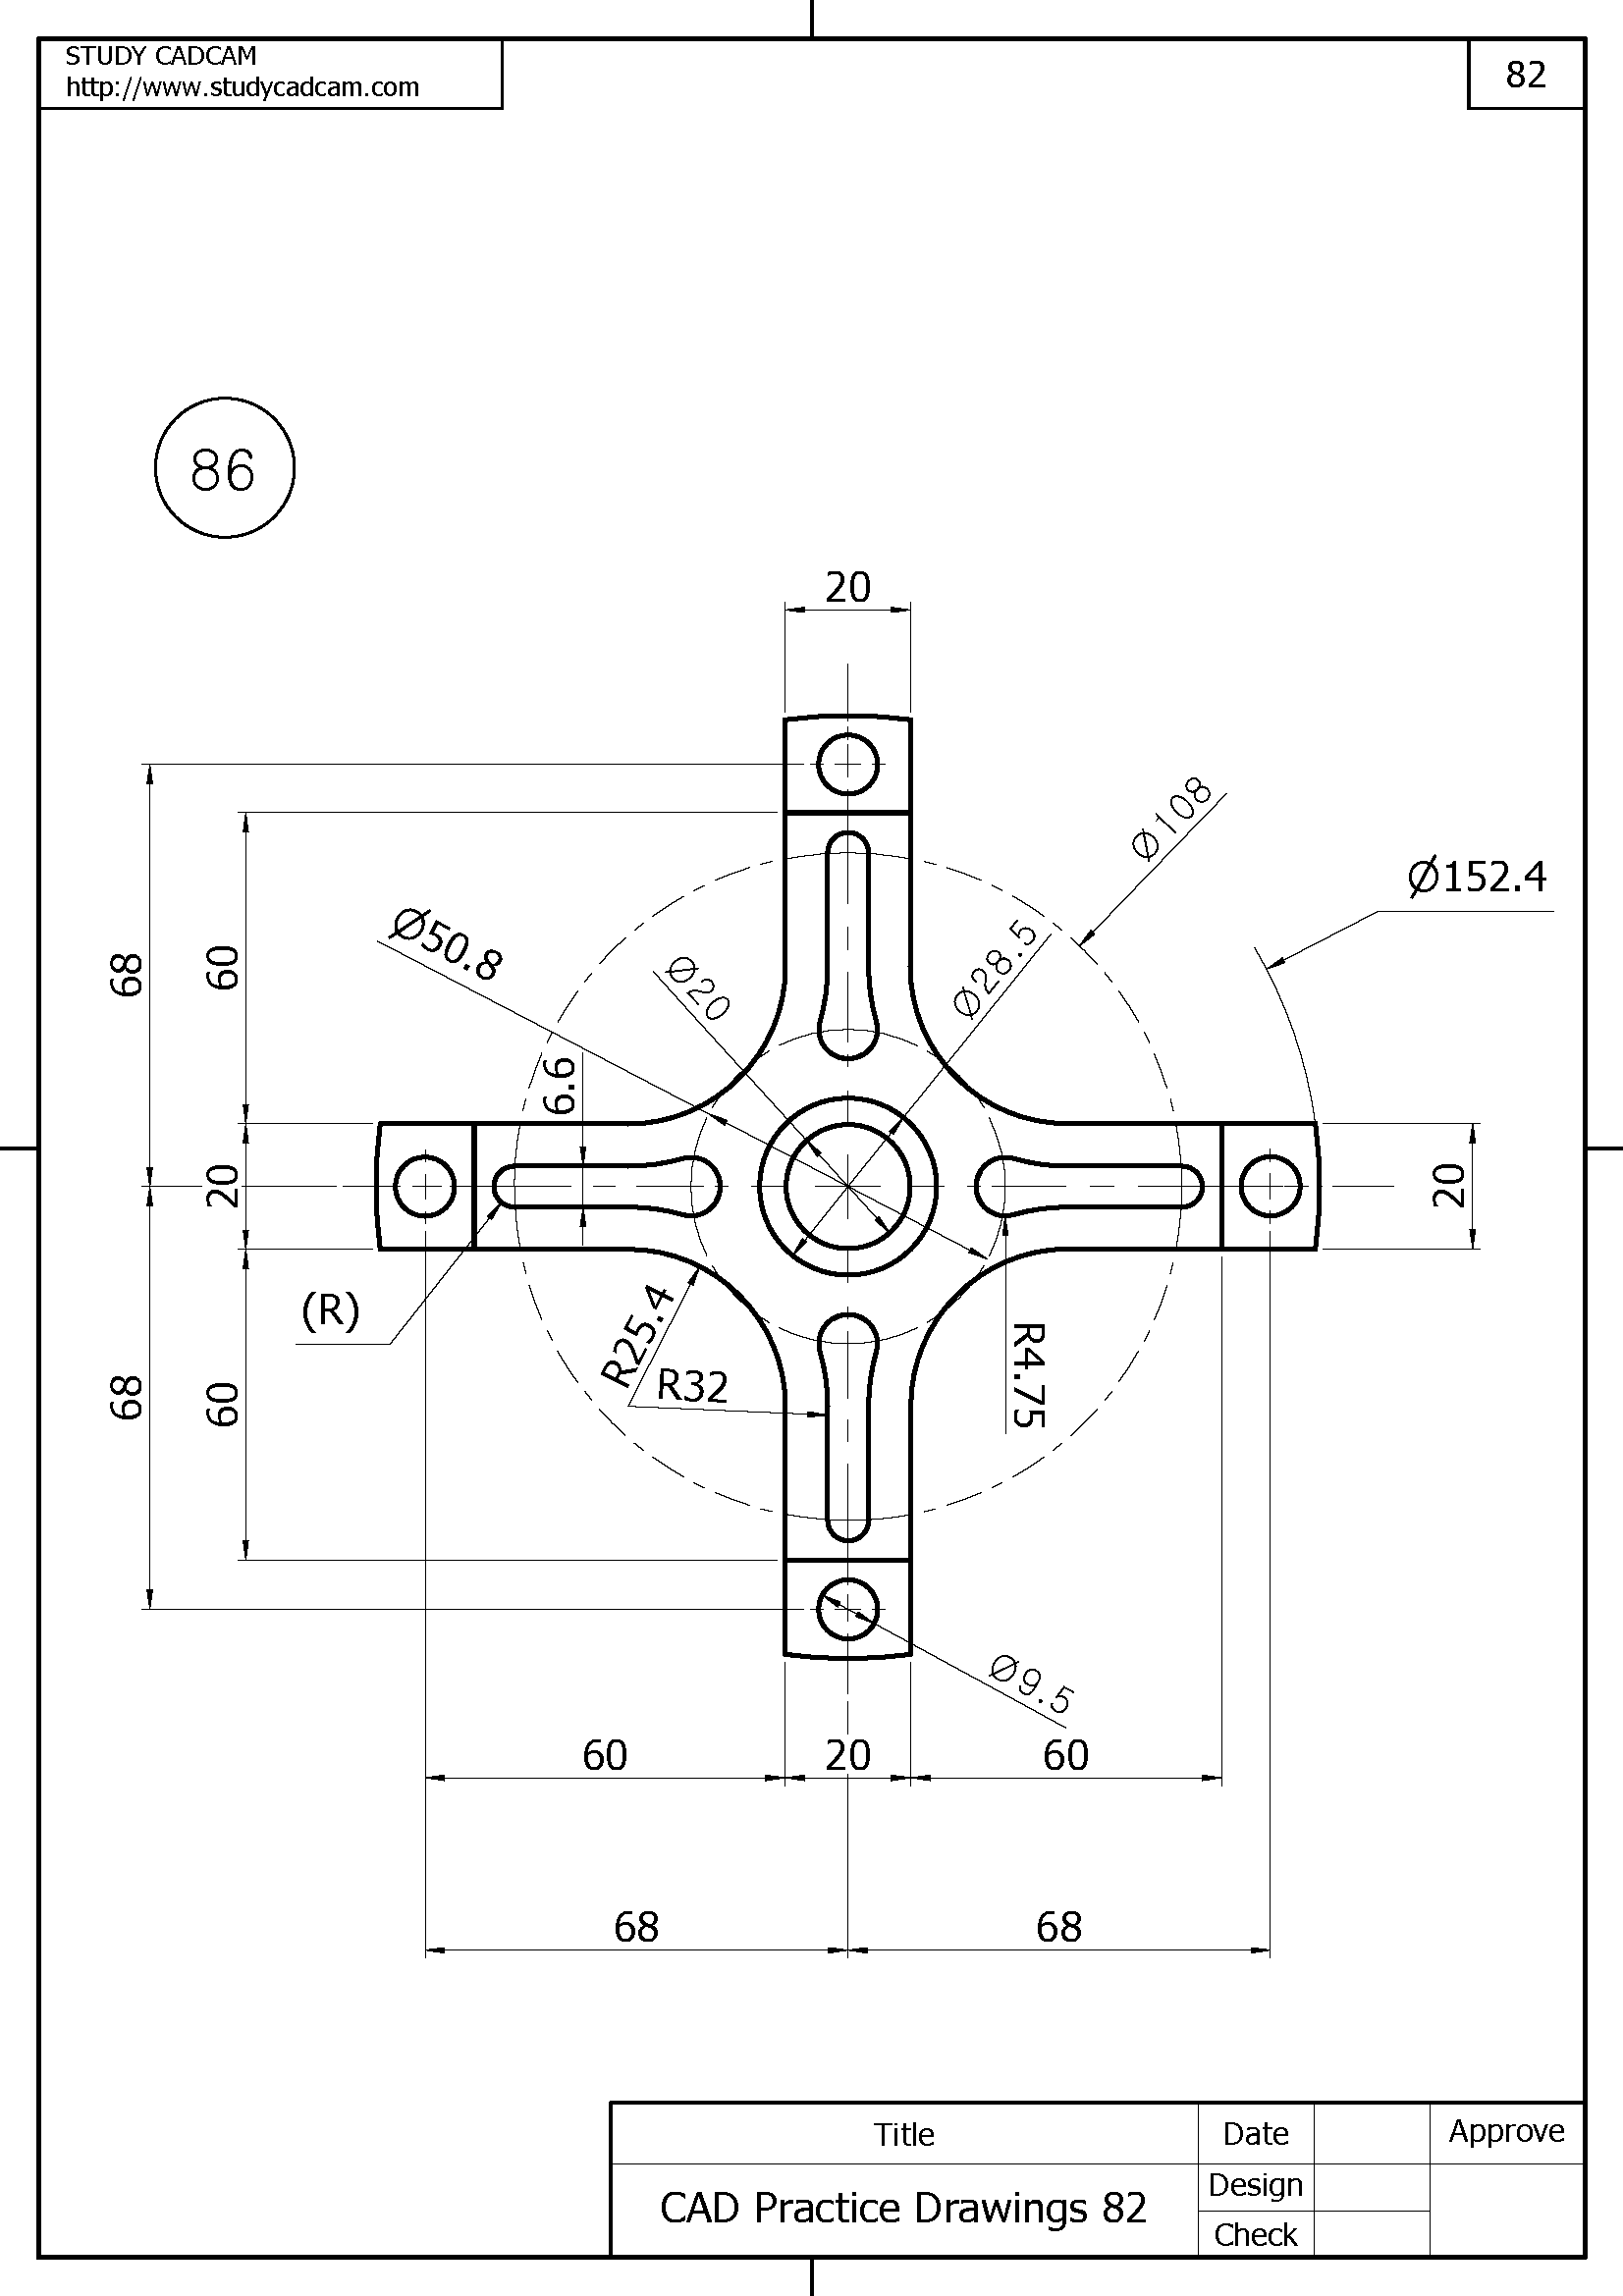 Pin De Studycadcam Em Cad Practice Drawings